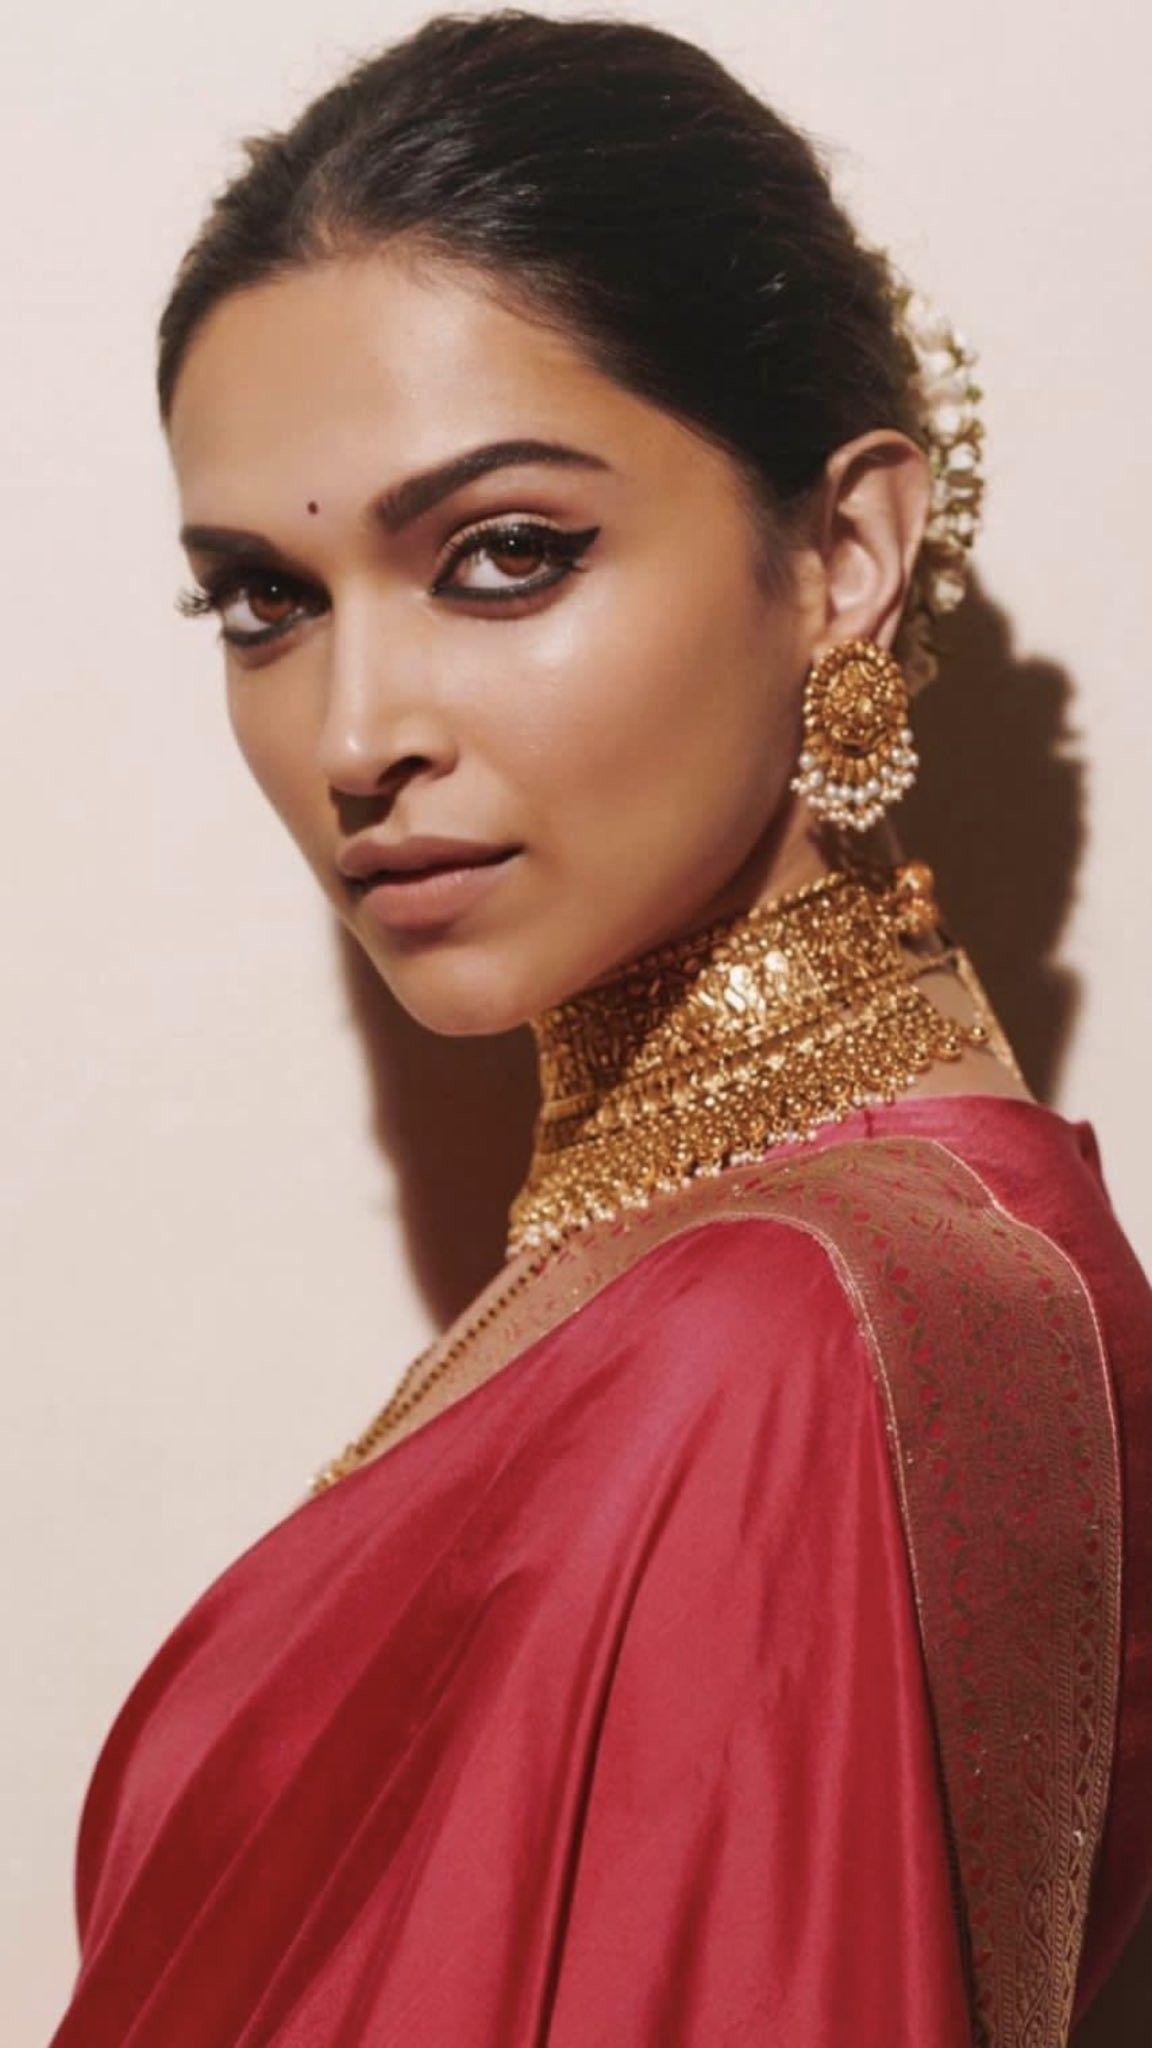 Deepika Padukone looks really elegant in this indian saree ...